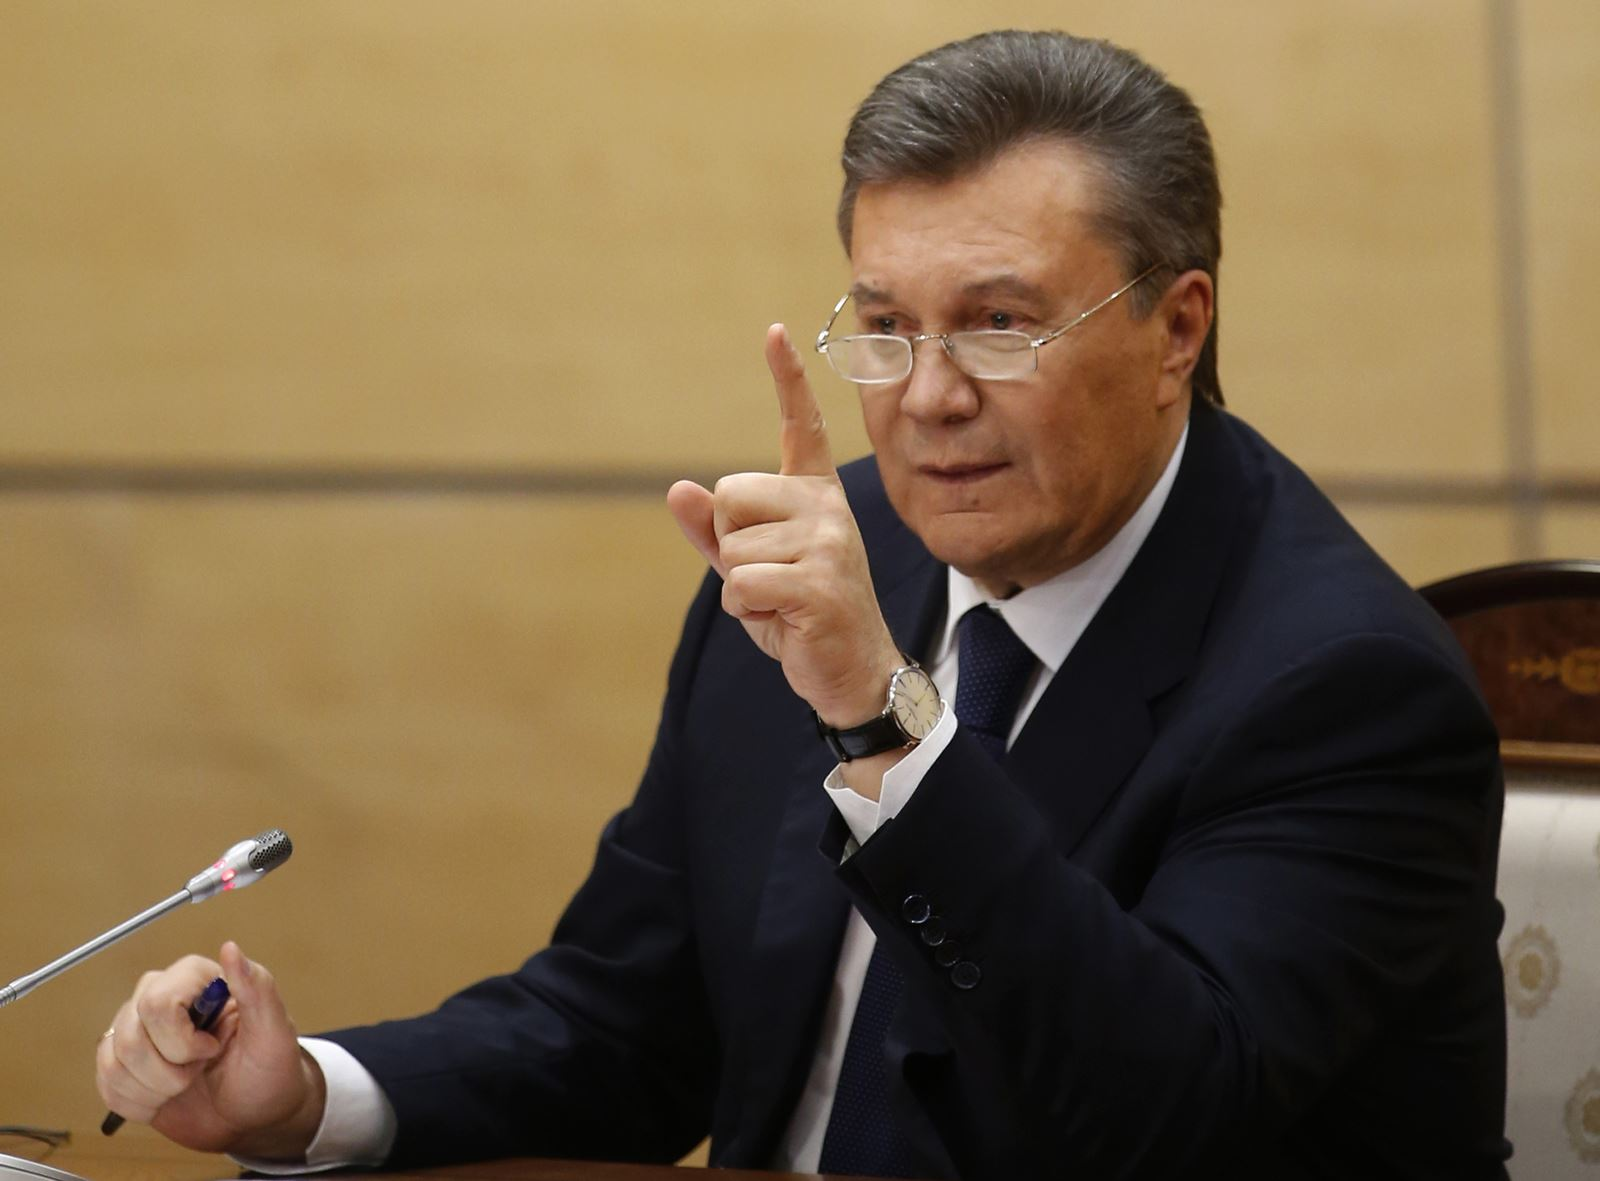 Tüm Ukrayna'da referandum çağrısı